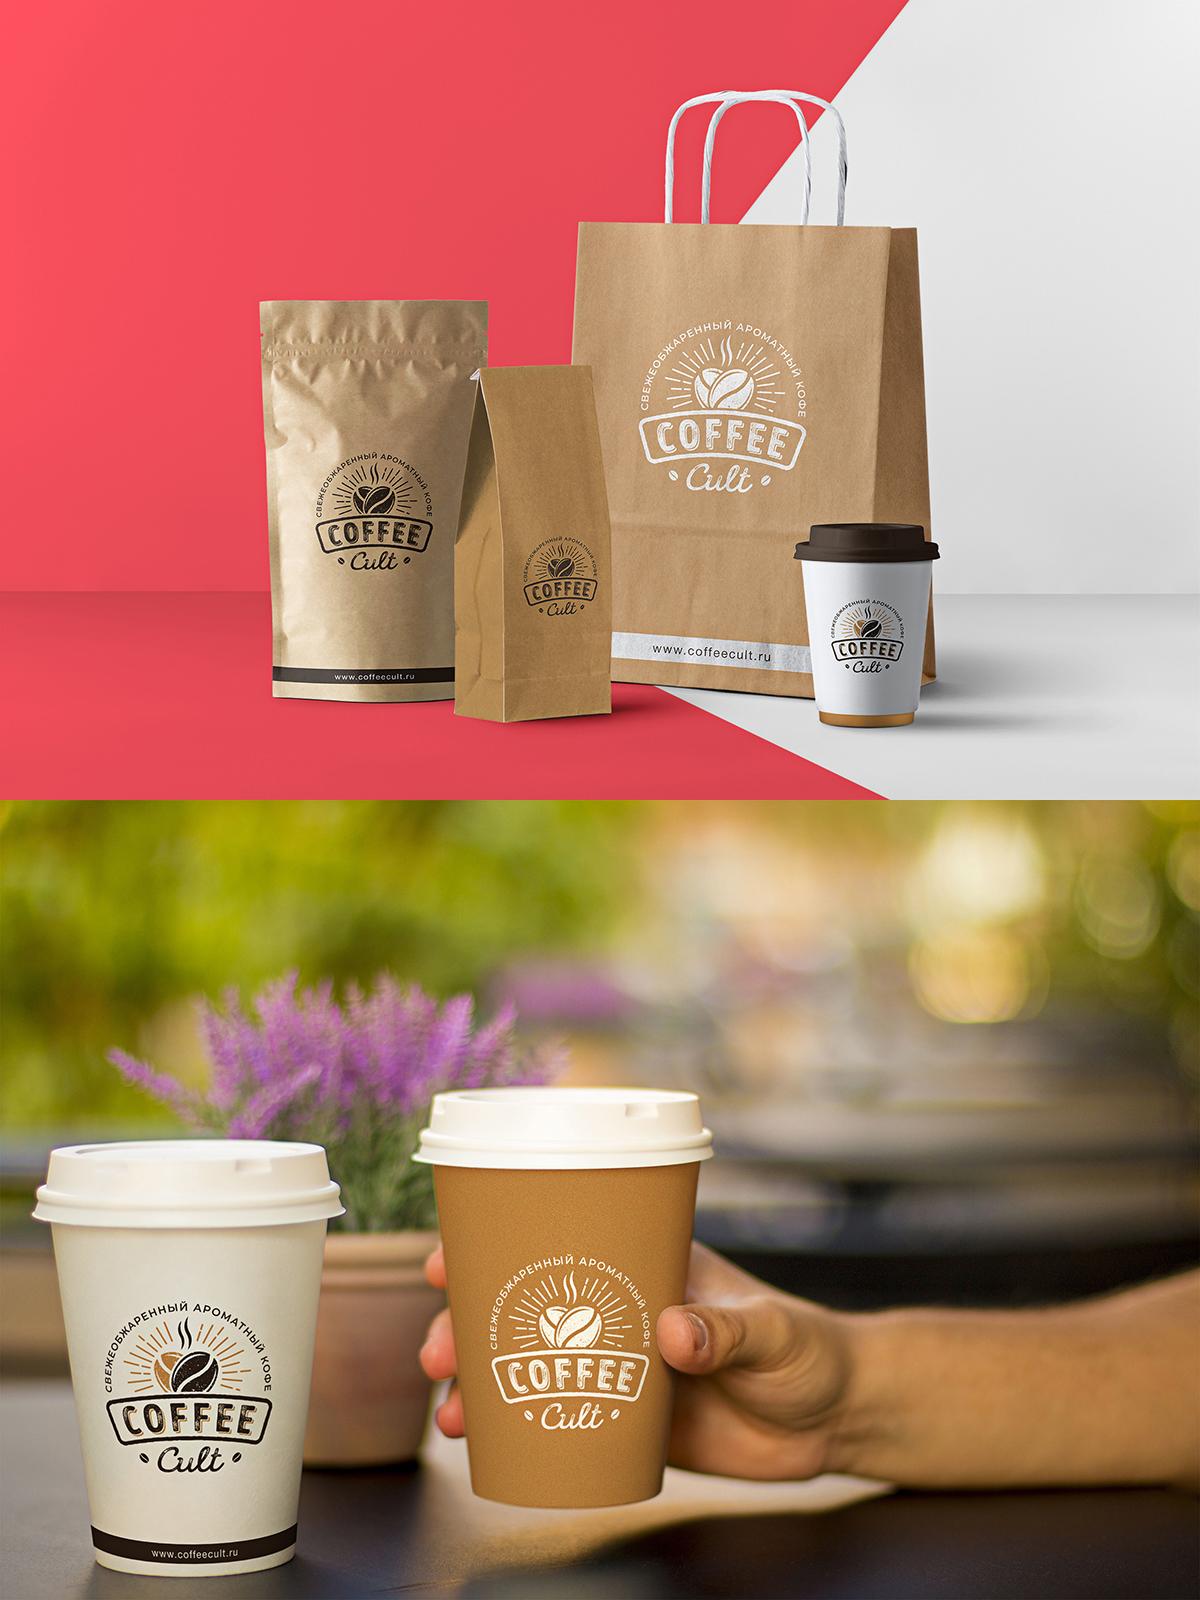 Логотип и фирменный стиль для компании COFFEE CULT фото f_0235bc9a0bb78293.jpg